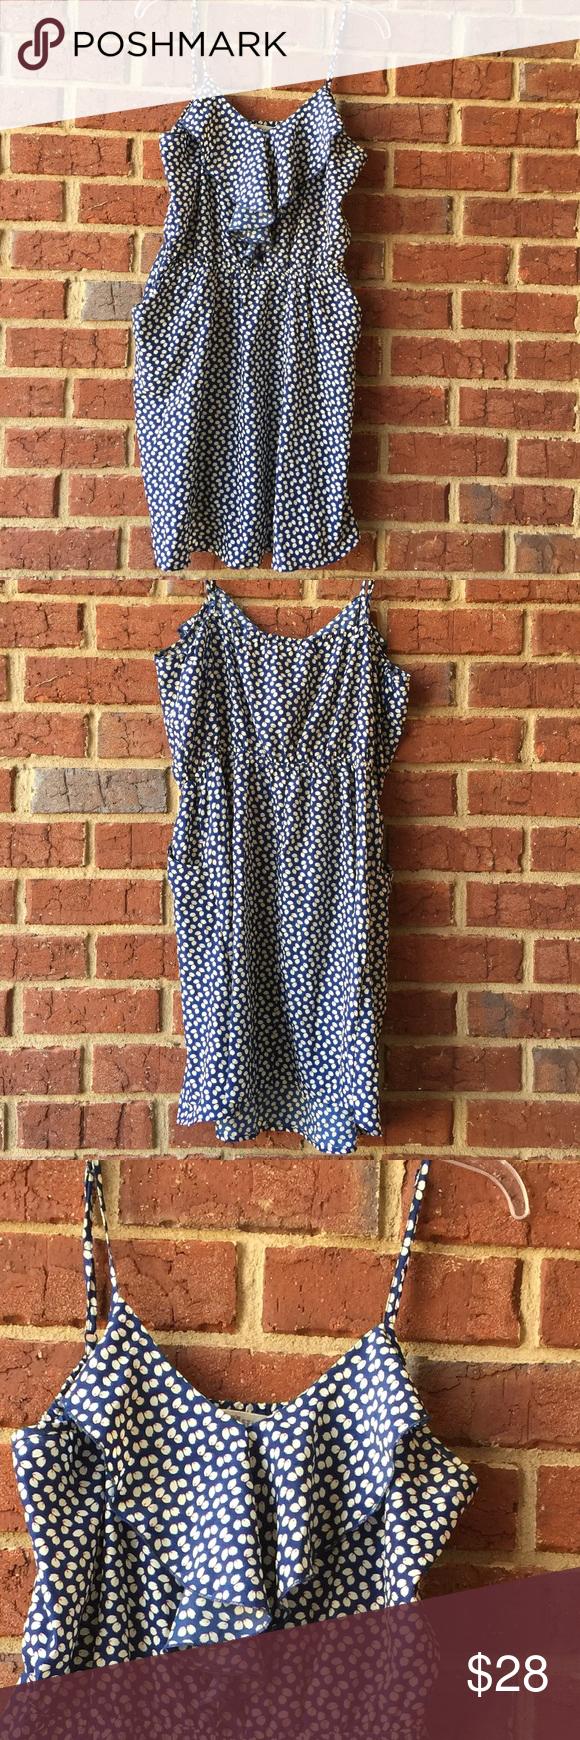 Altar'd State dress. Size XL Cute! cute! Altar'd State spaghetti strap dress. Size XL Altar'd State Dresses